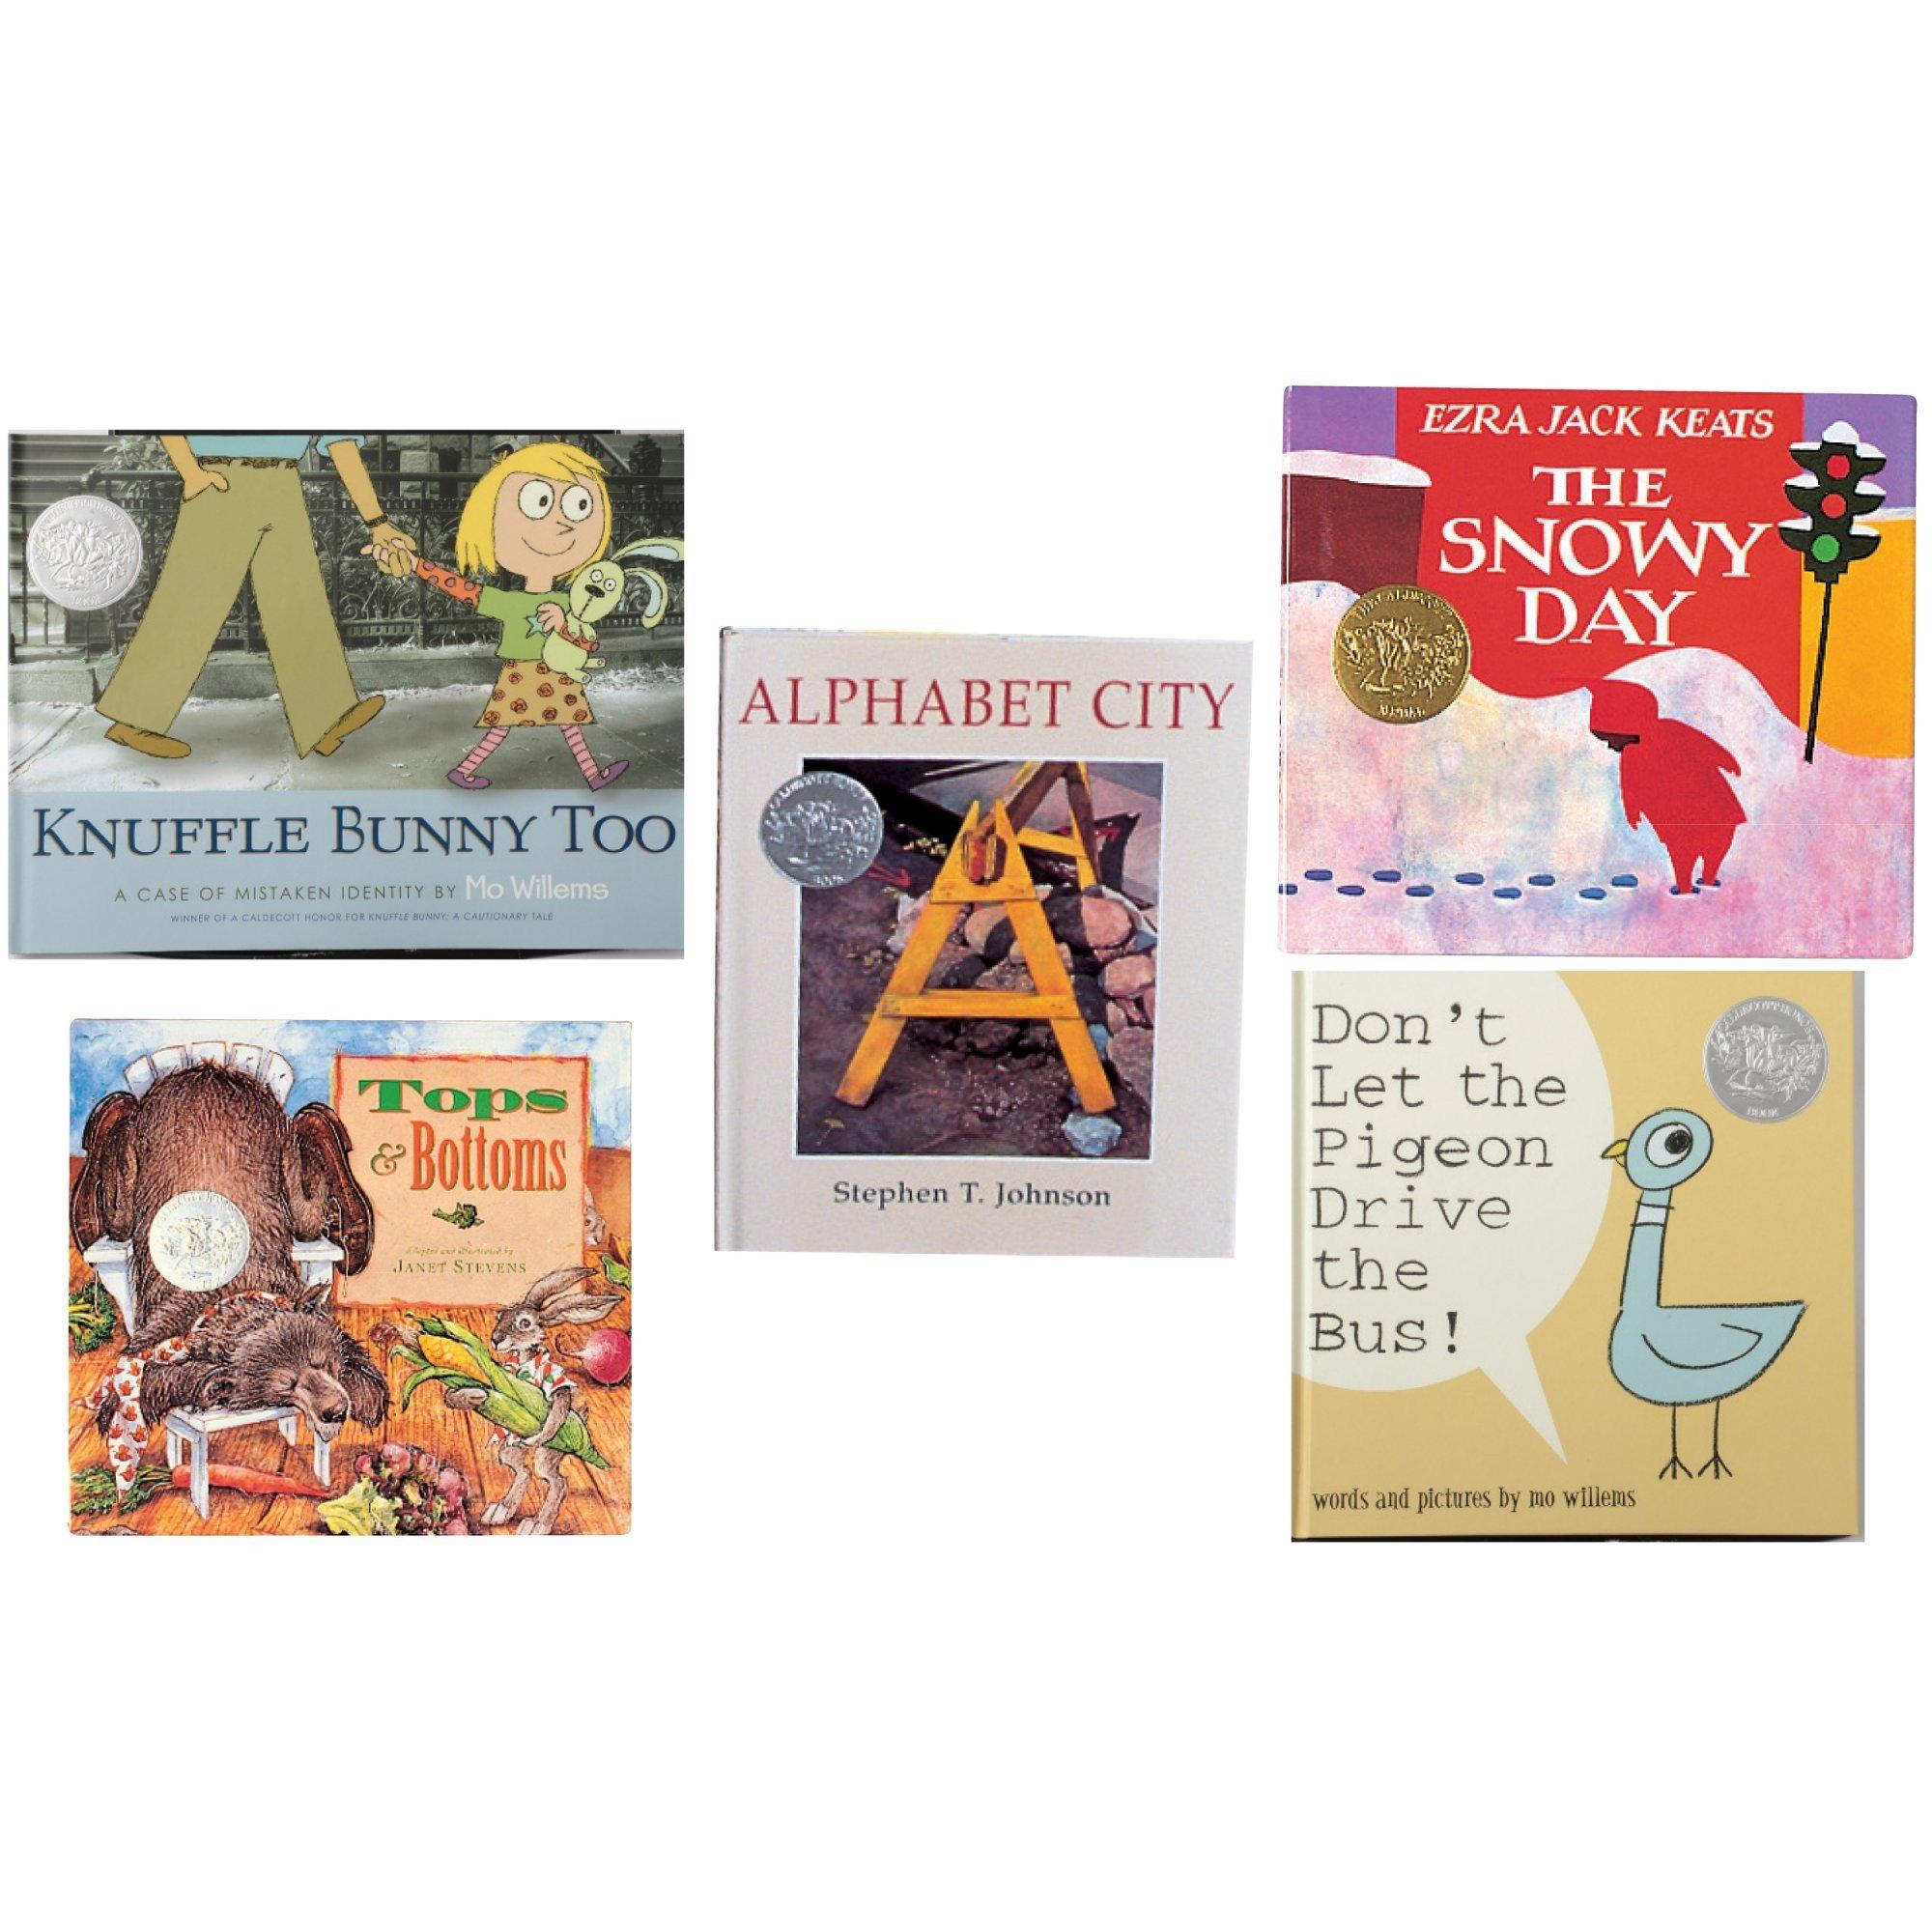 Constructive Playthings BOK-108 Caldecott Medal Books of 5 Hardcover Titles, Grade: Kindergarten to 3, Set of 2